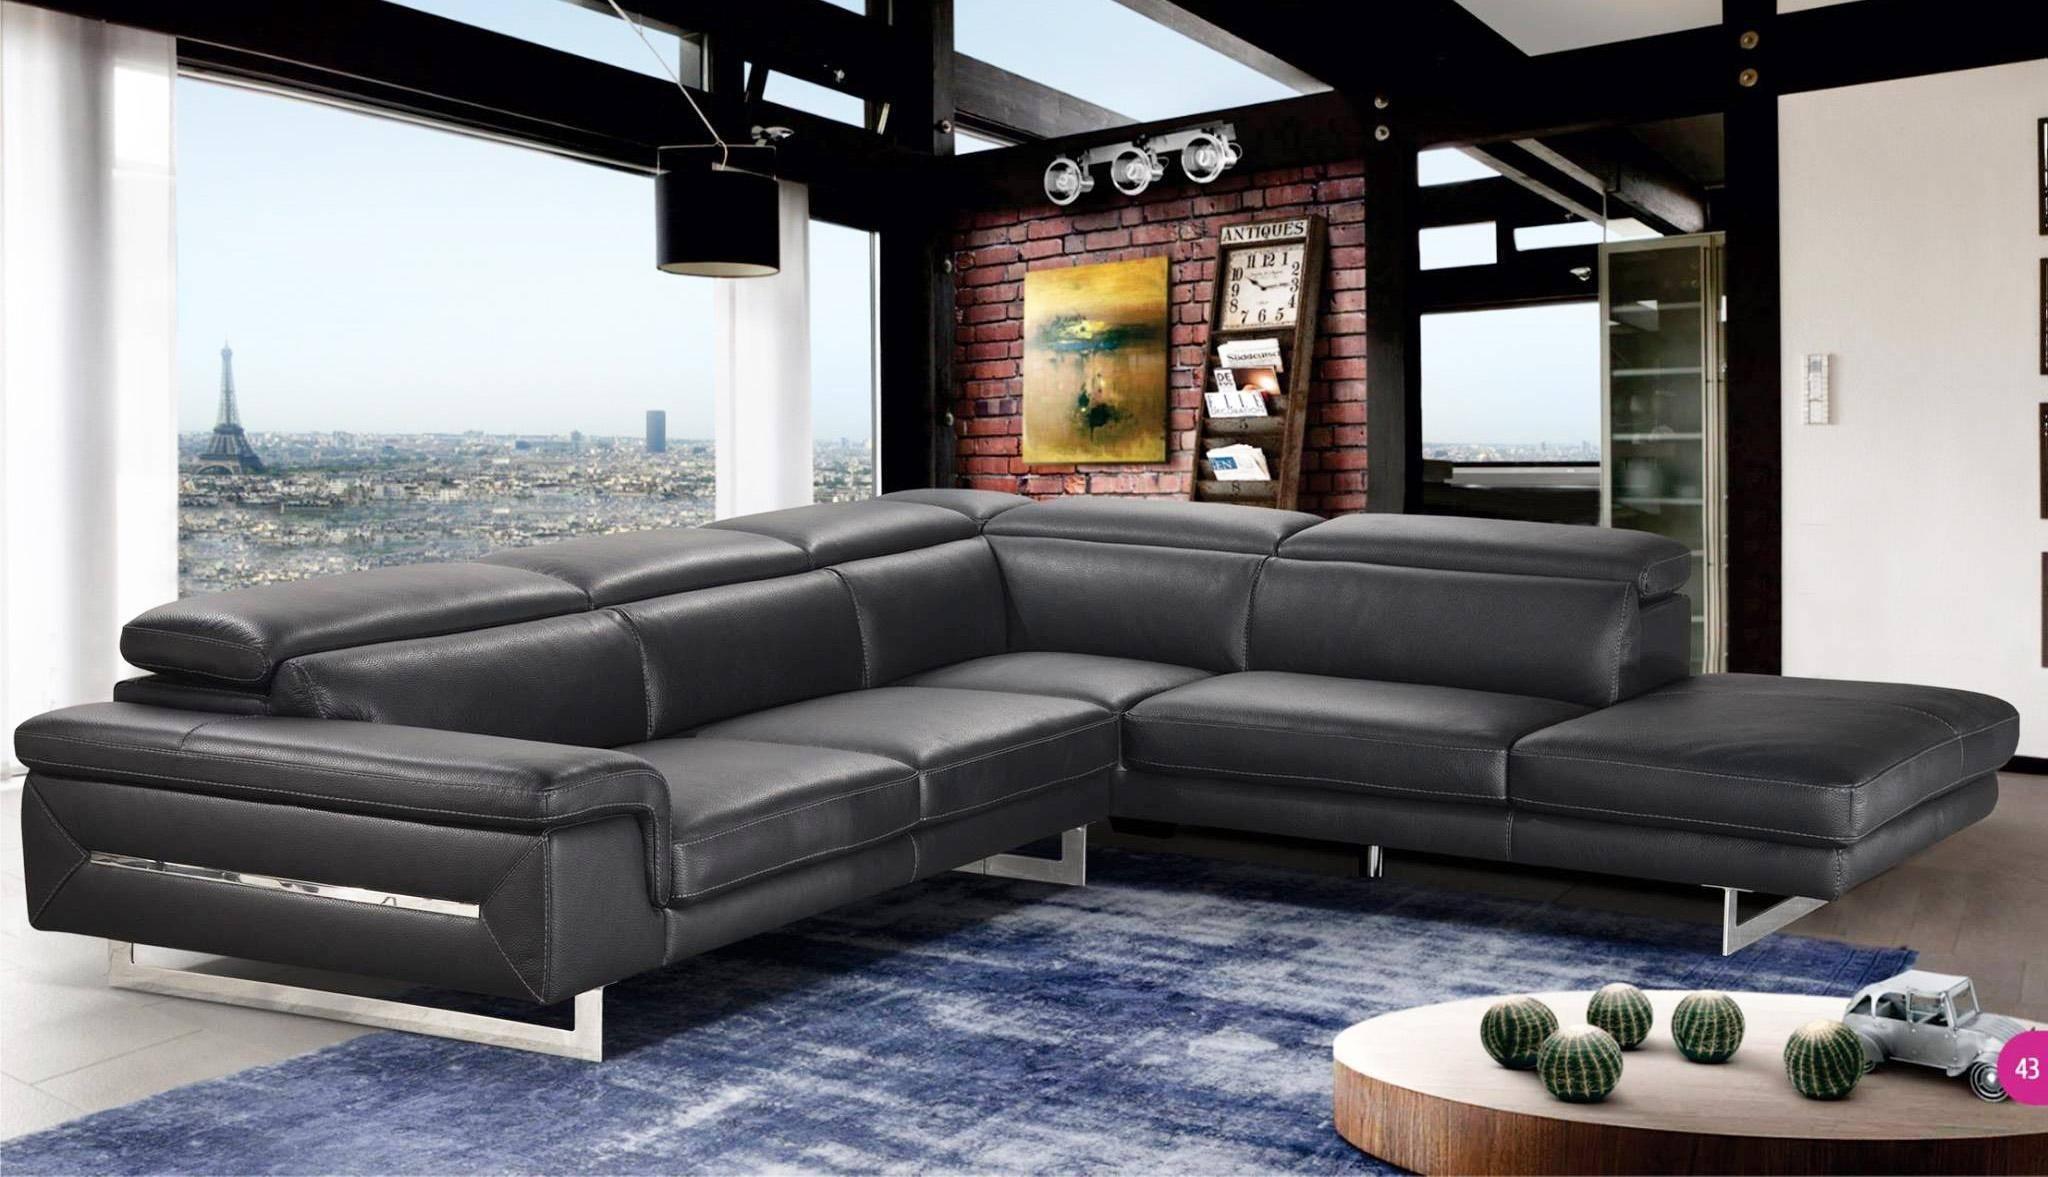 Buy Vig Accenti Italia Lazio Sectional Sofa Left Hand Chase In Black Italian Leather Online